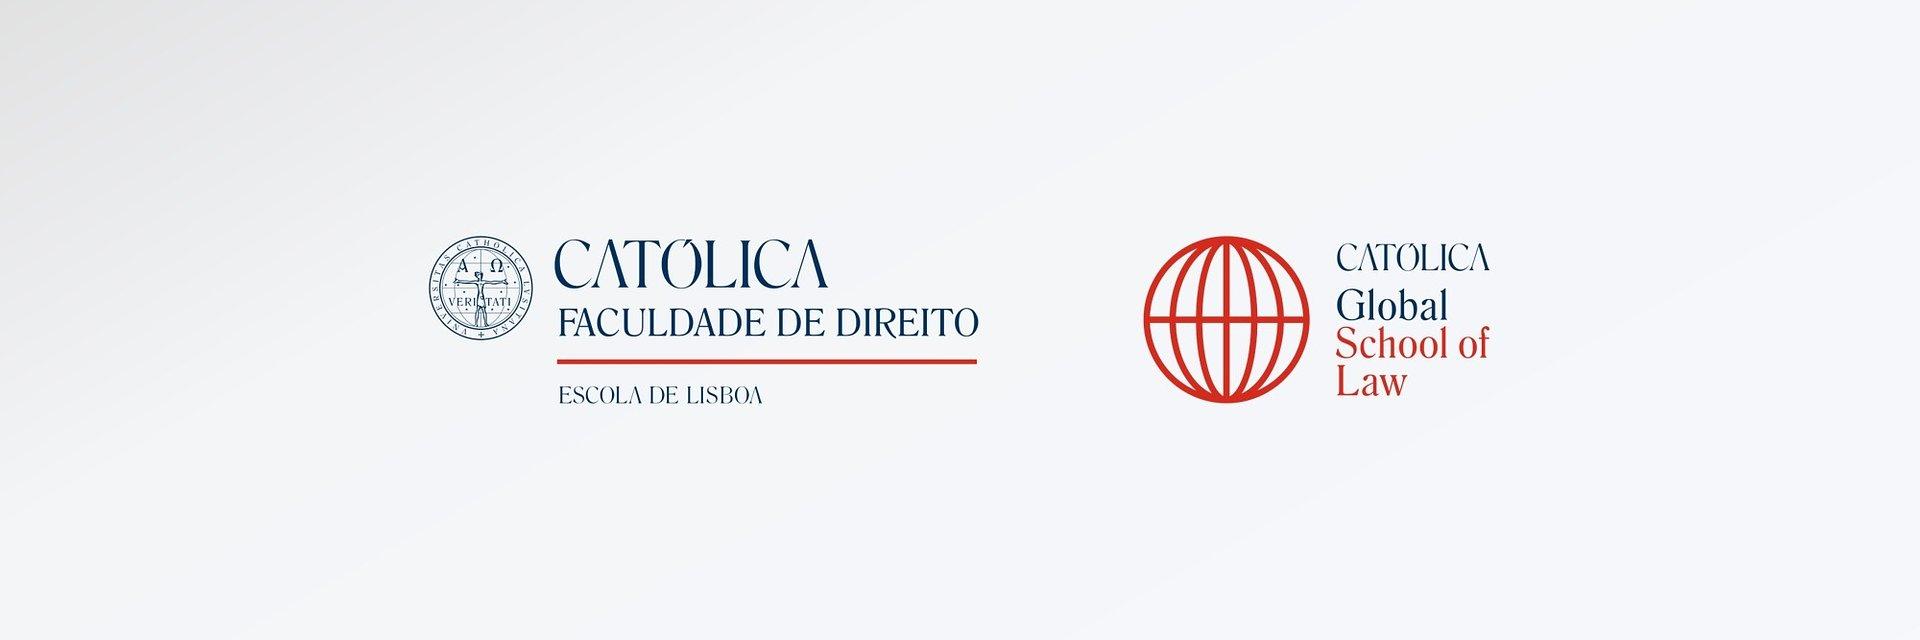 Law Schools Global League promove debate internacional sobre as implicações legais da Covid-19